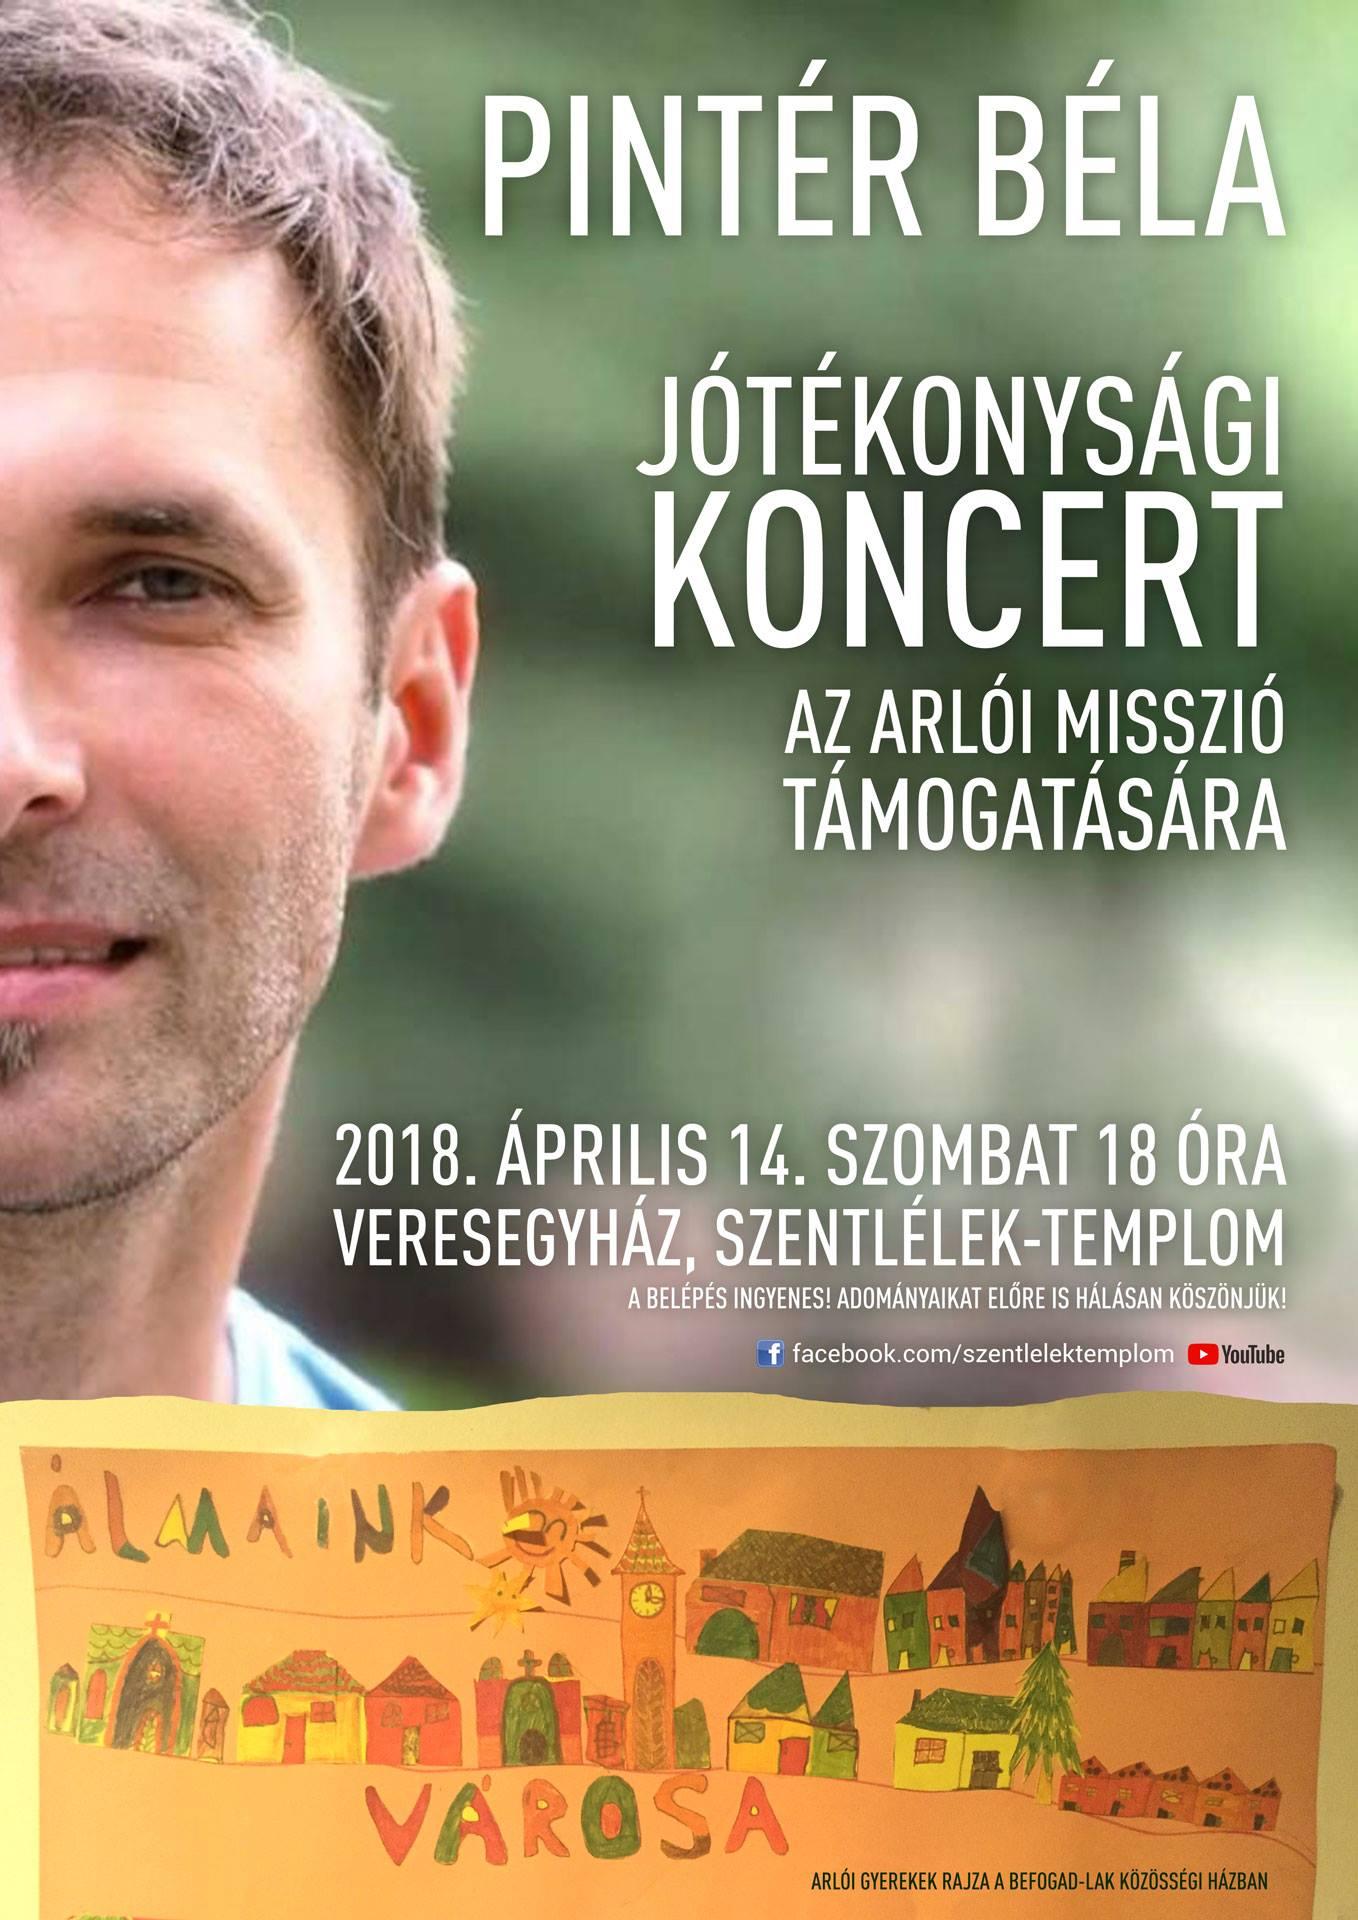 Pintér Béla koncert